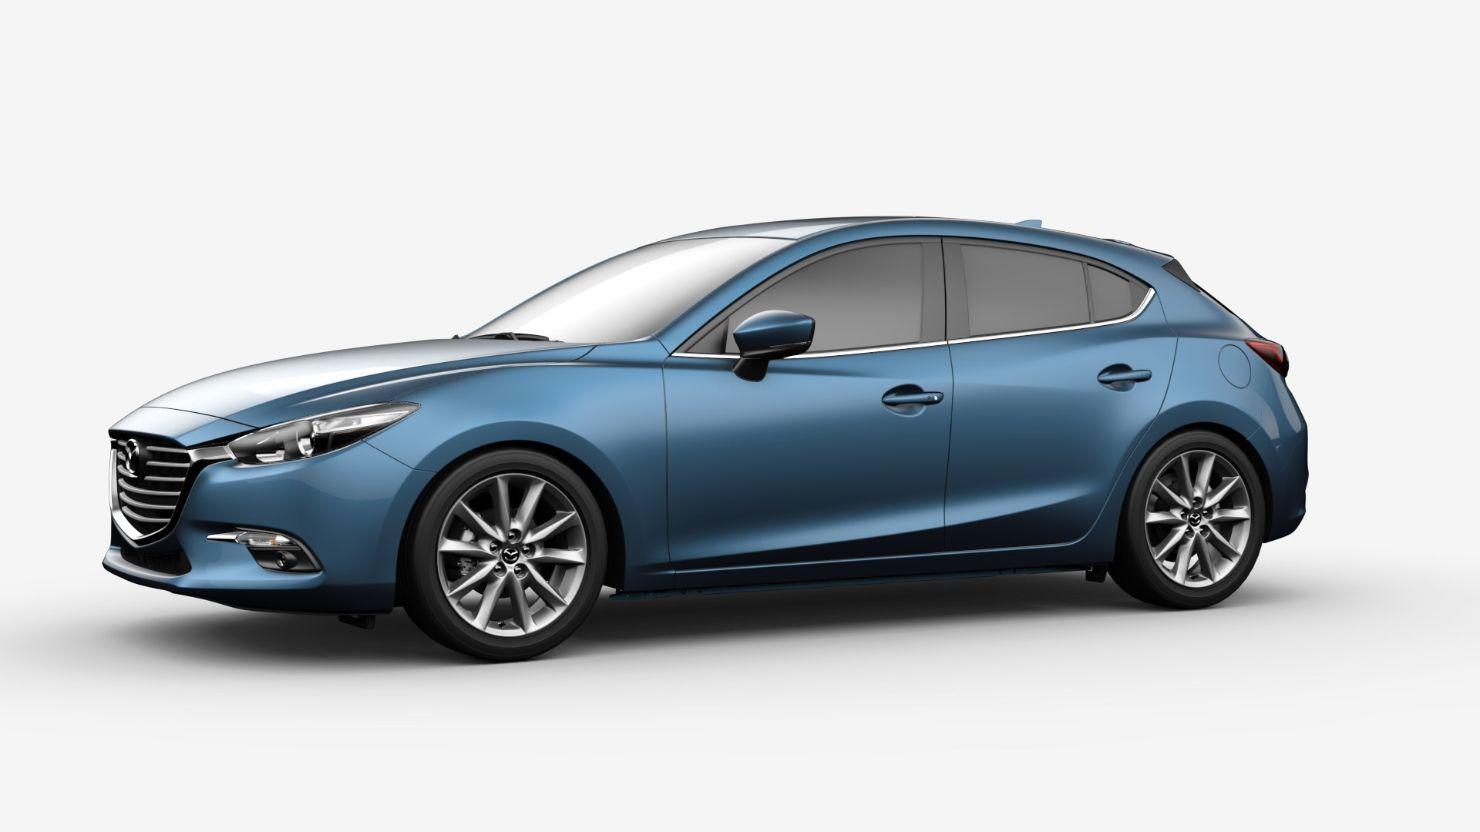 2017 Mazda 3 Hatchback Fuel Efficient Compact Car Usa